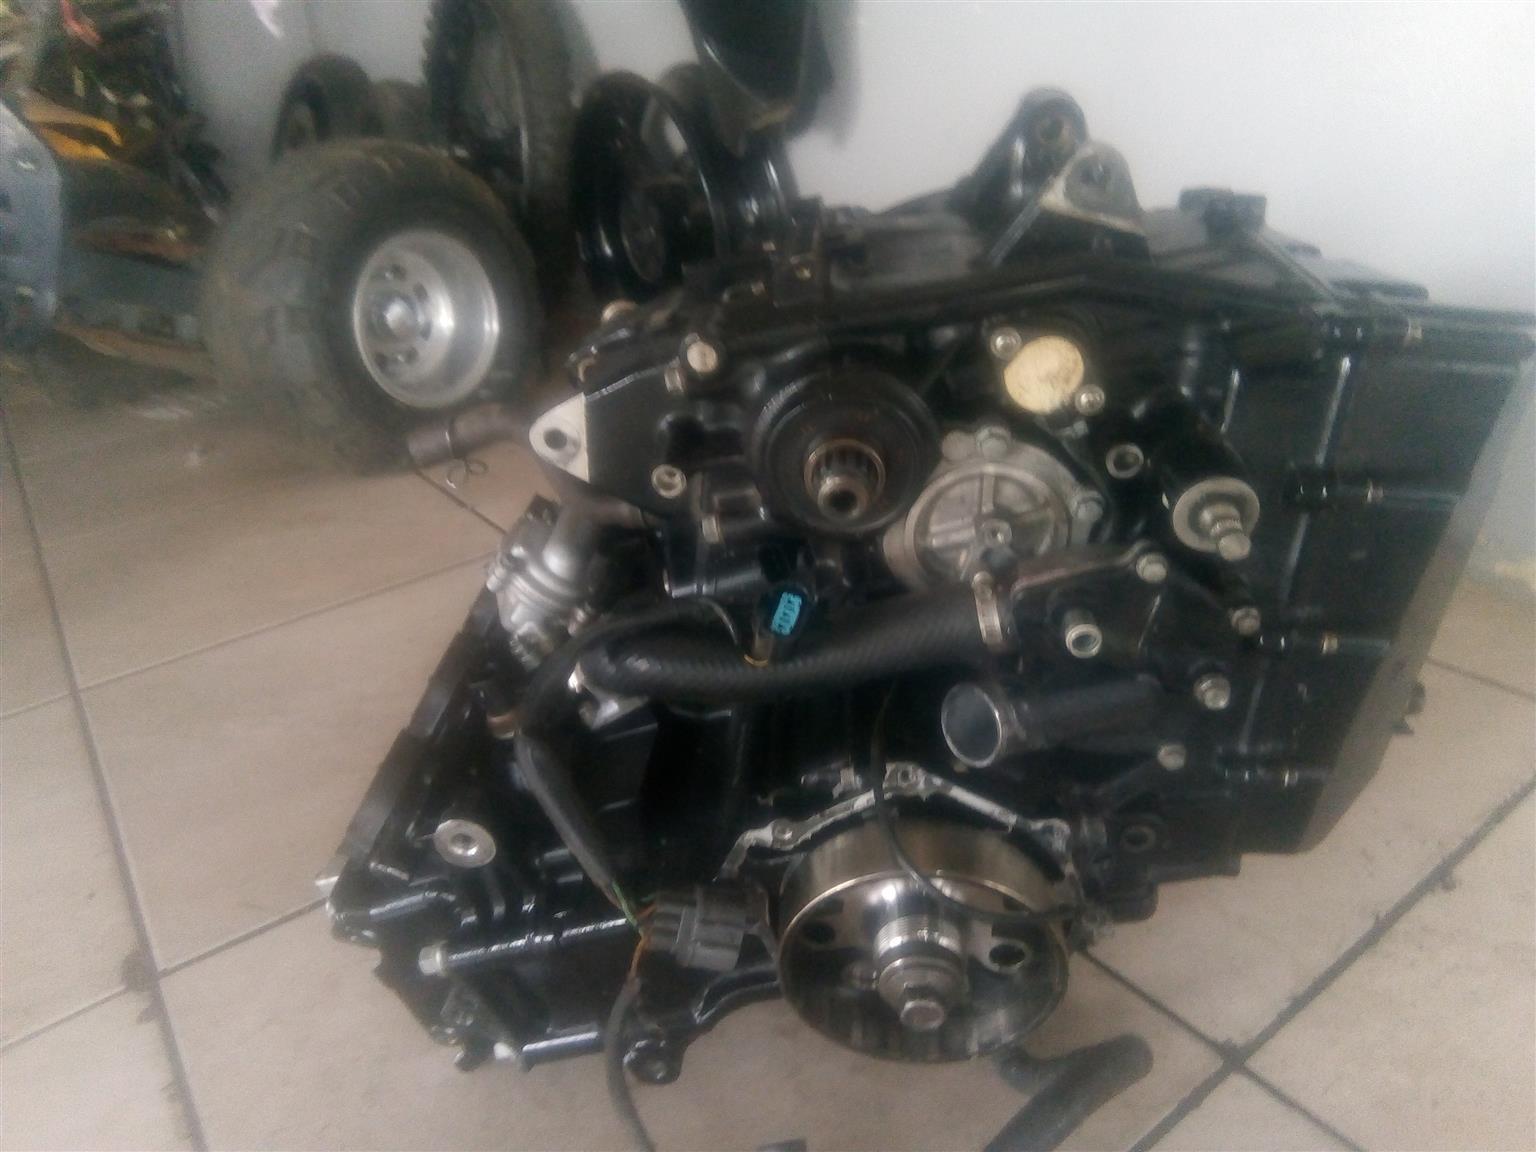 Kawasaki ZX 10 , 2010 stripping for spares